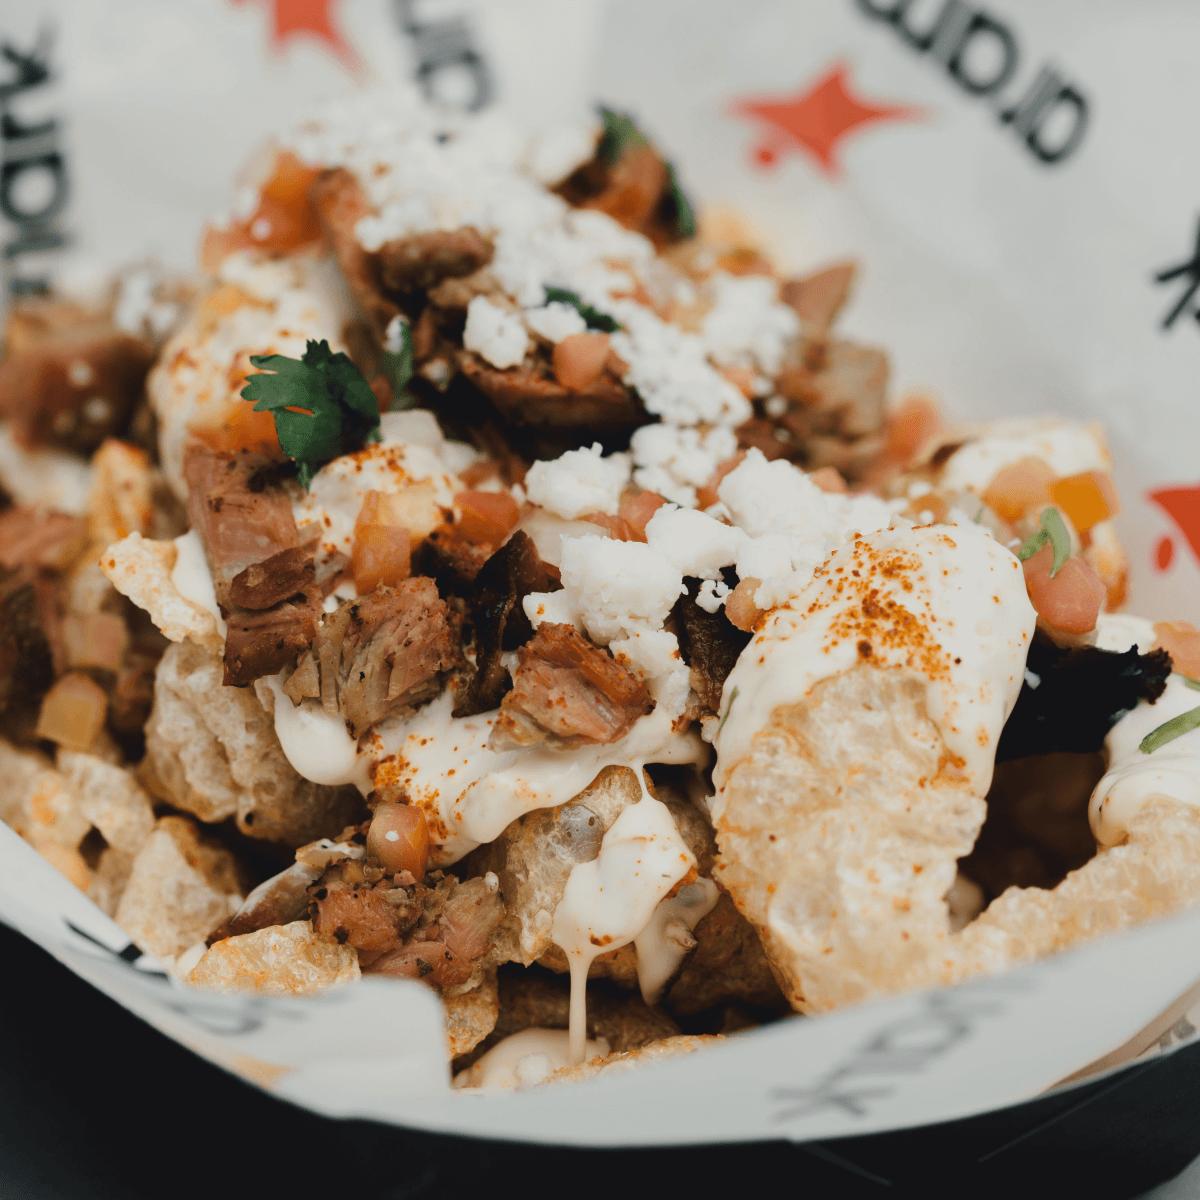 AT&T Center concessions 2016-2017 chicharrones nachos